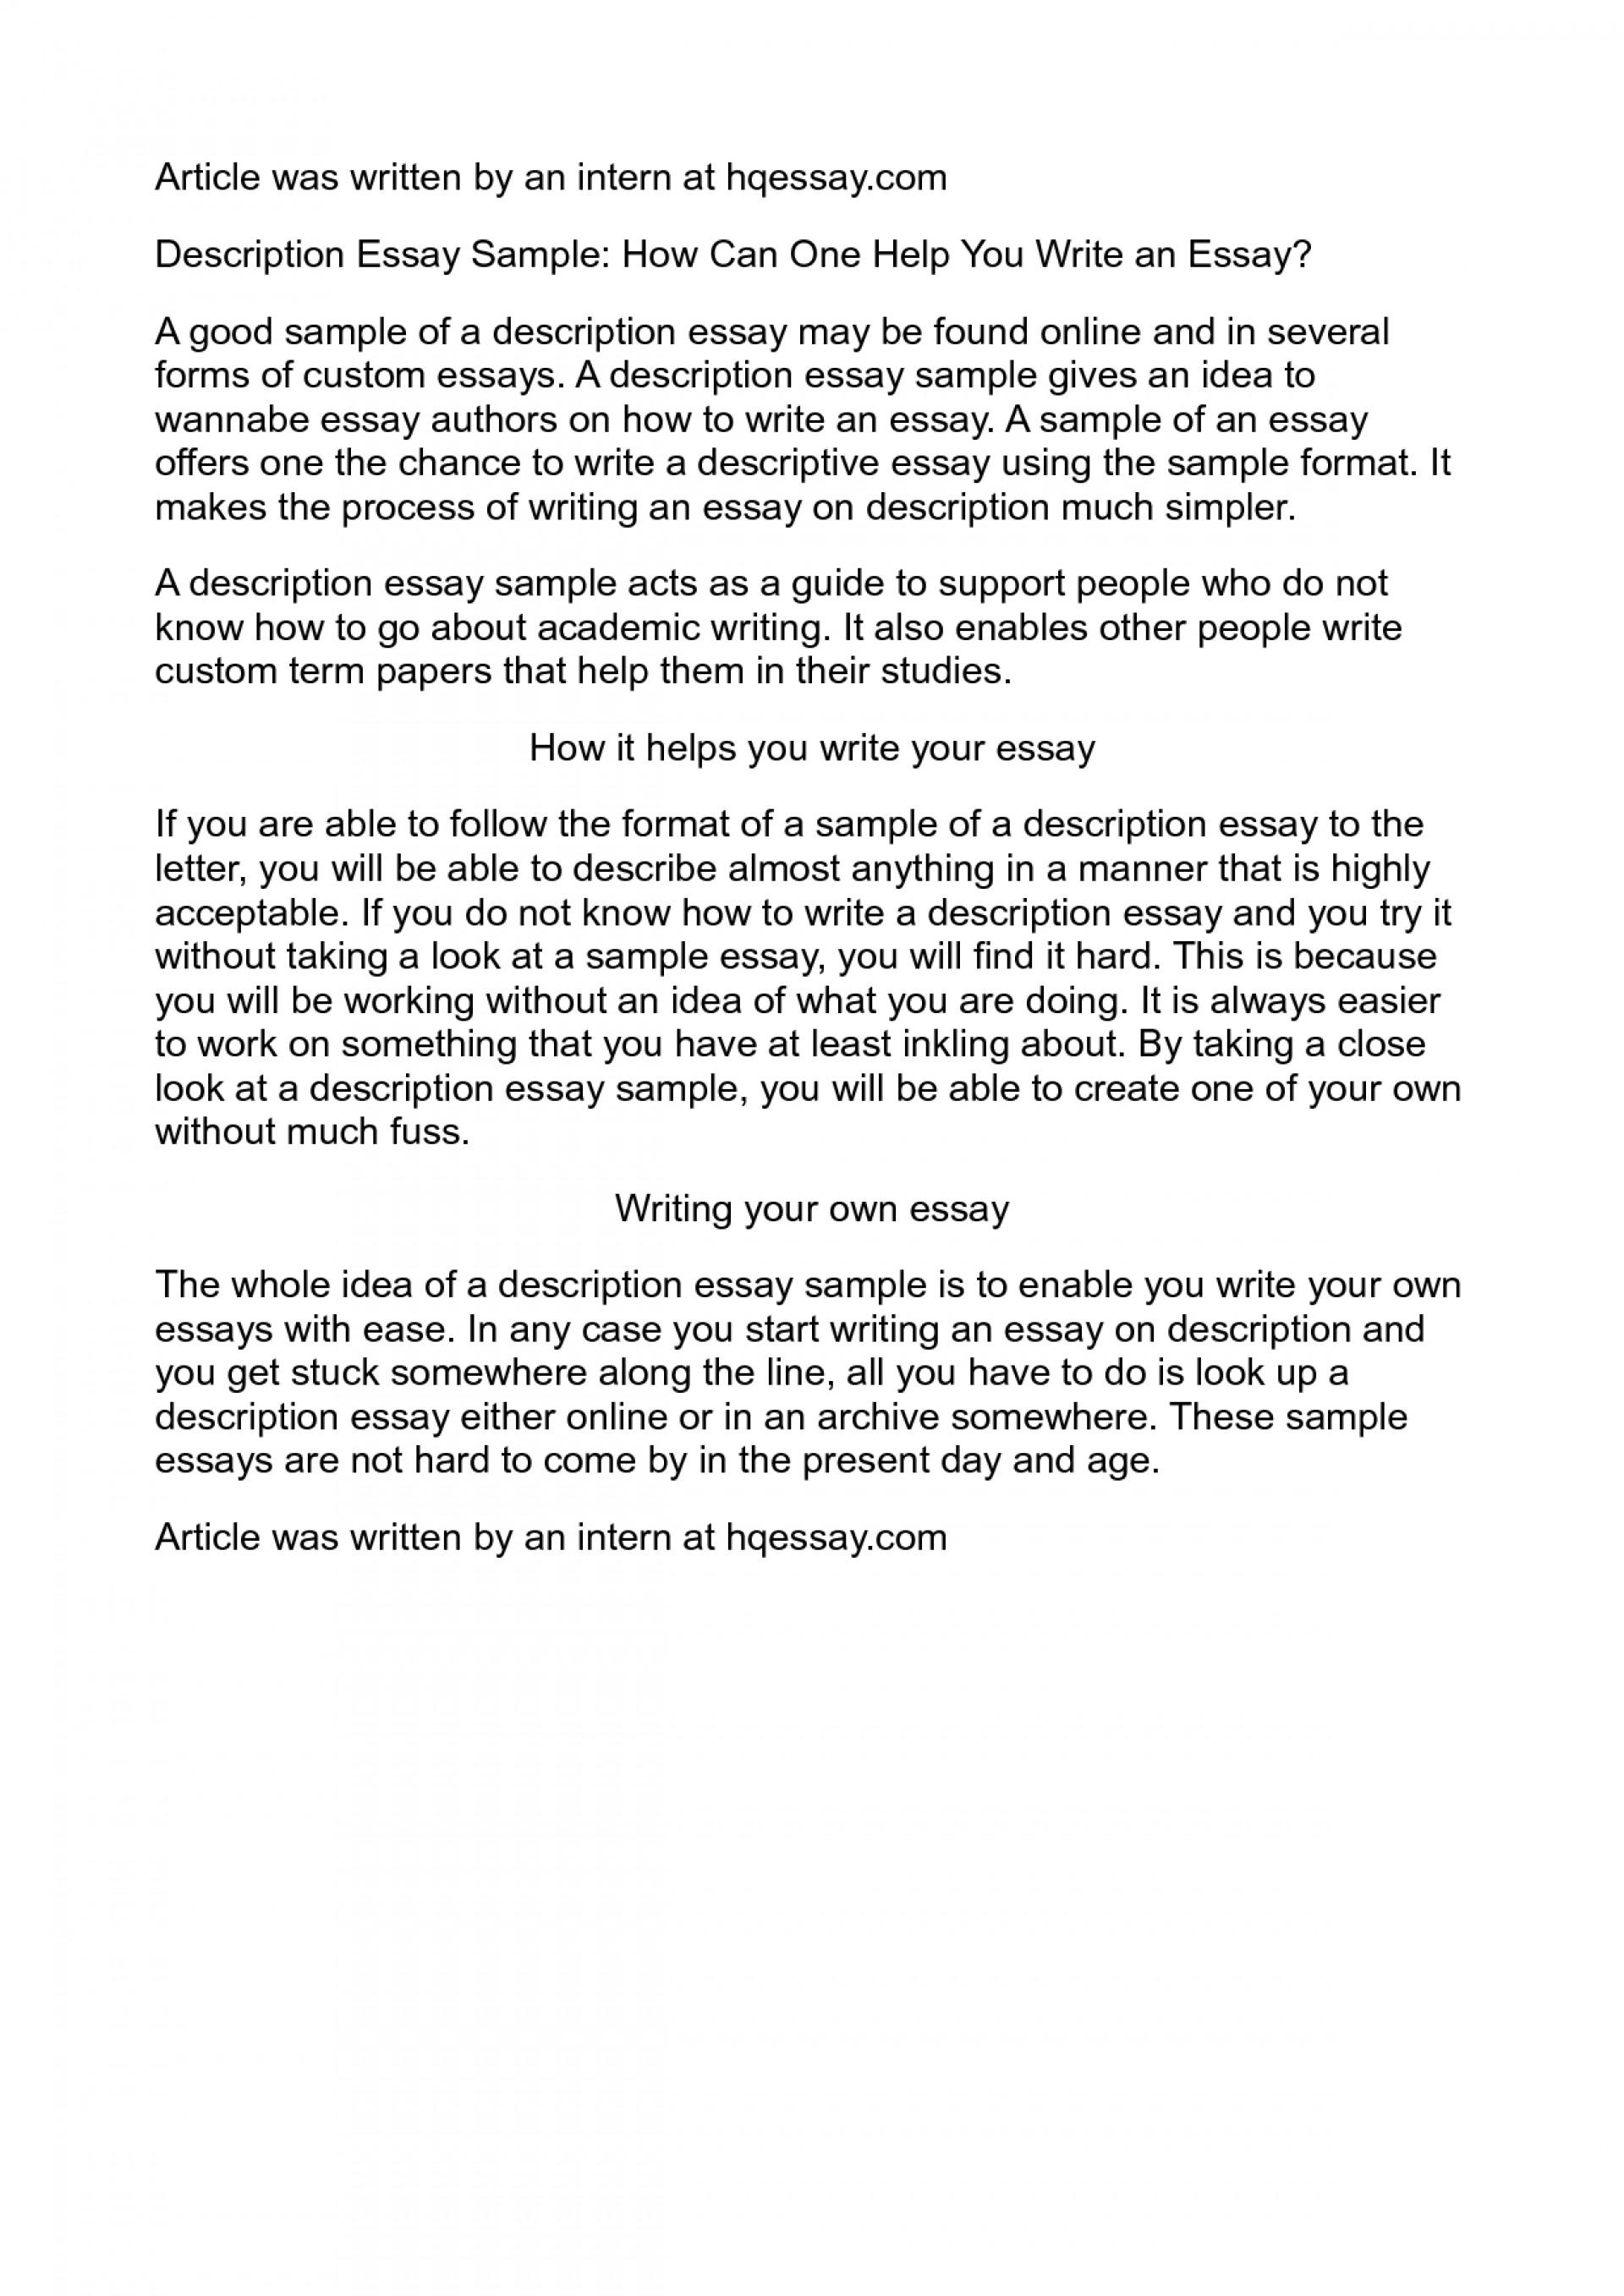 006 Essay Example Description Impressive Descriptive Topics College About A Pet 1920